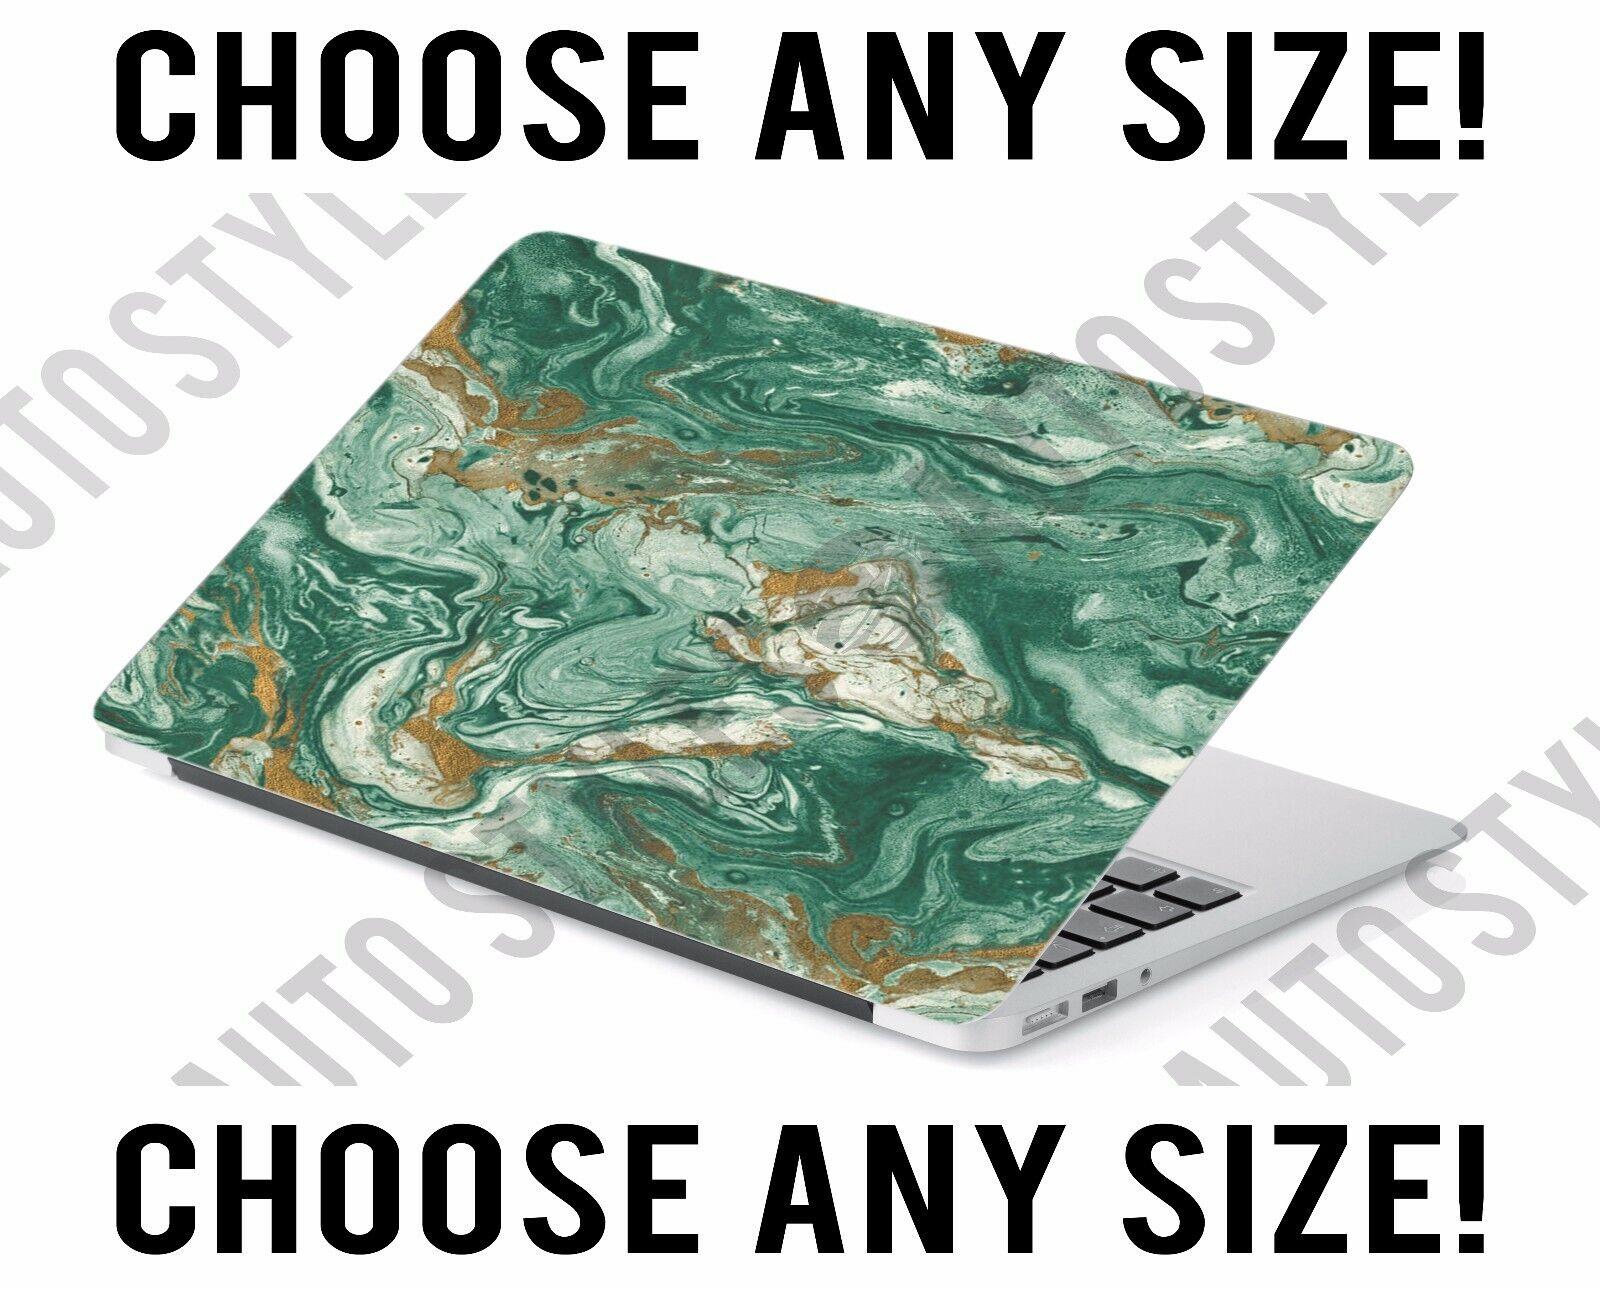 Green Gold Water Marble Laptop Skin Decal Sticker Tablet Ski